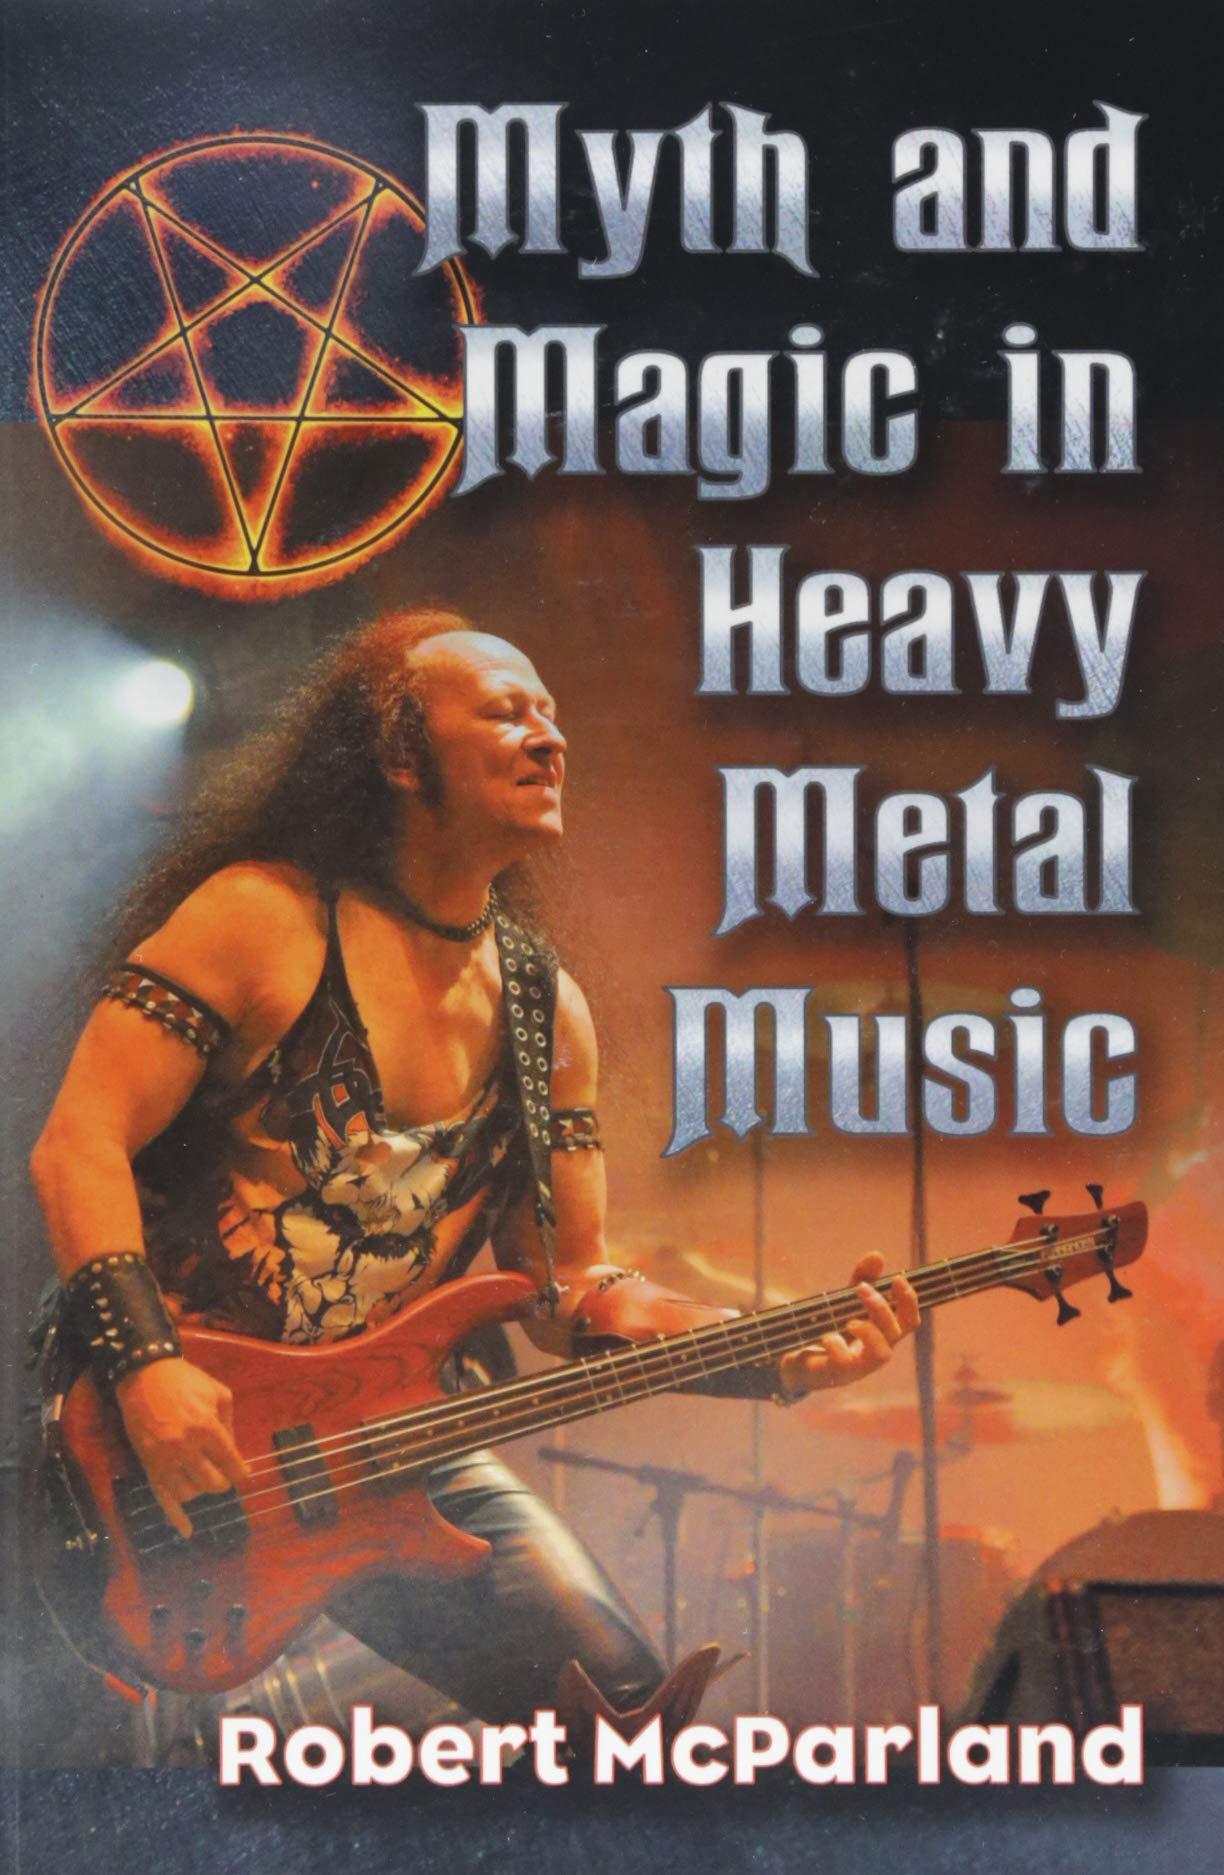 Myth and Magic in Heavy Metal Music: Robert McParland